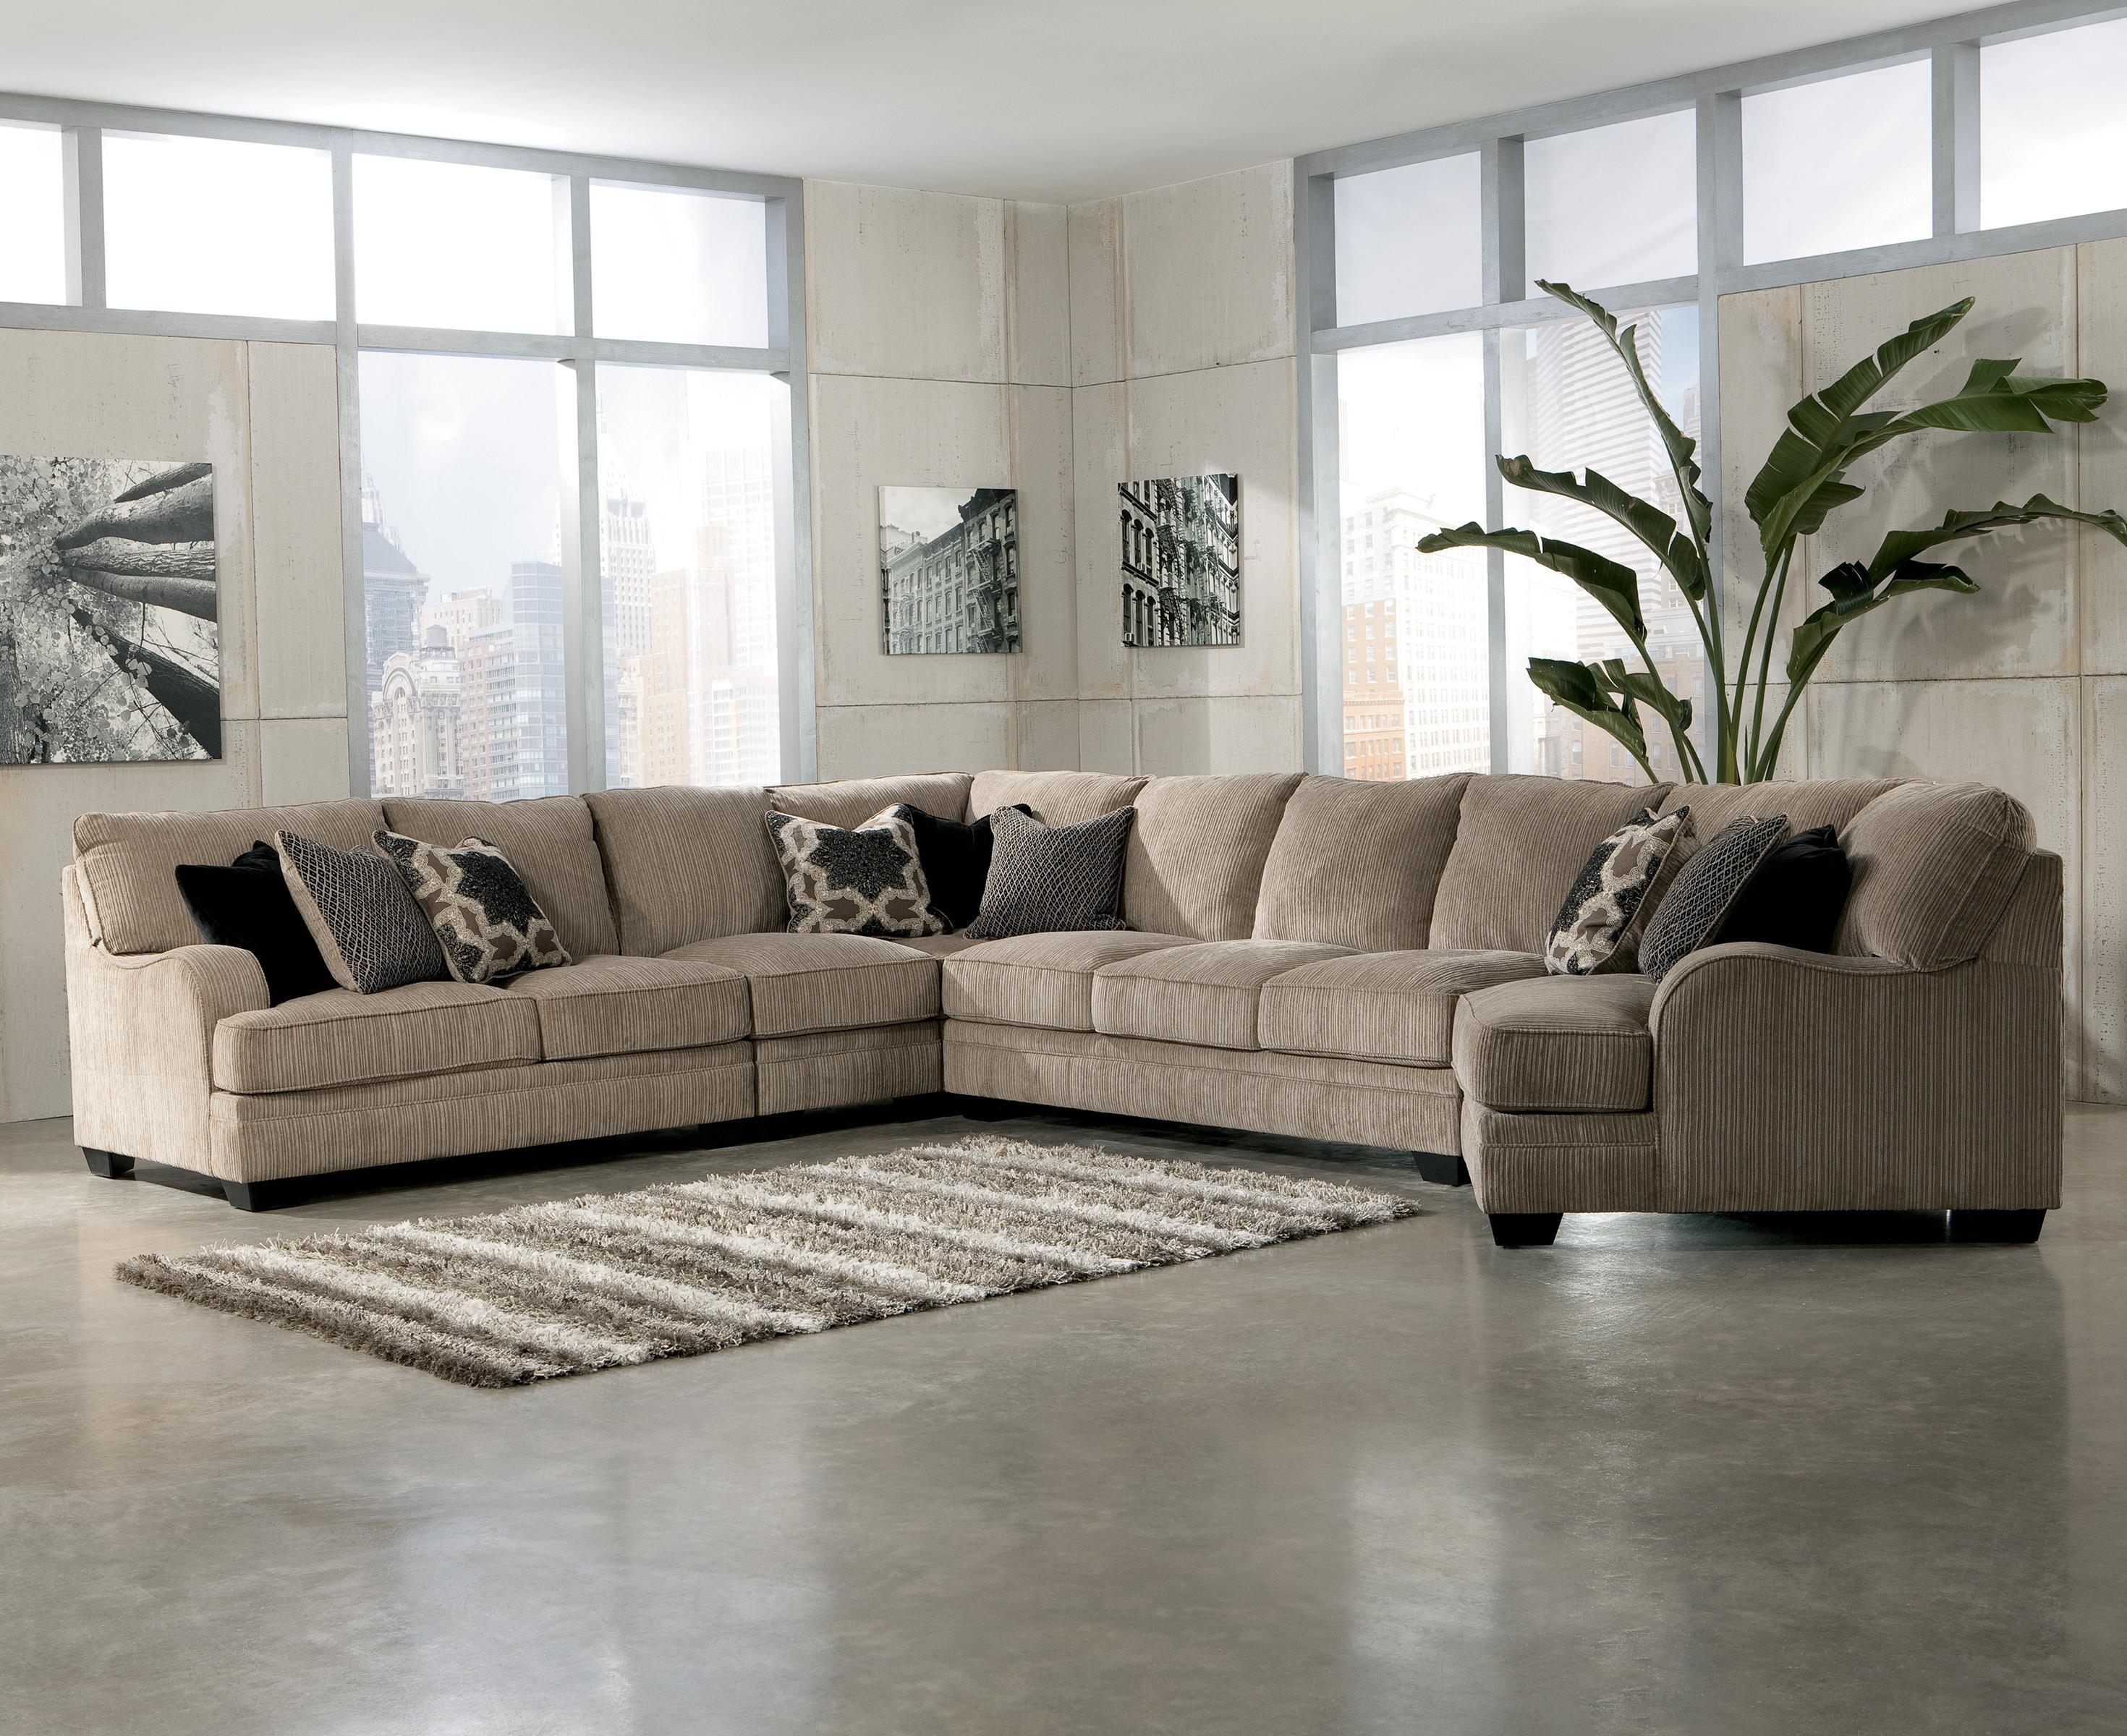 Signature Designashley Katisha – Platinum 5 Piece Sectional Regarding Signature Design Sectional Sofas (Image 20 of 20)